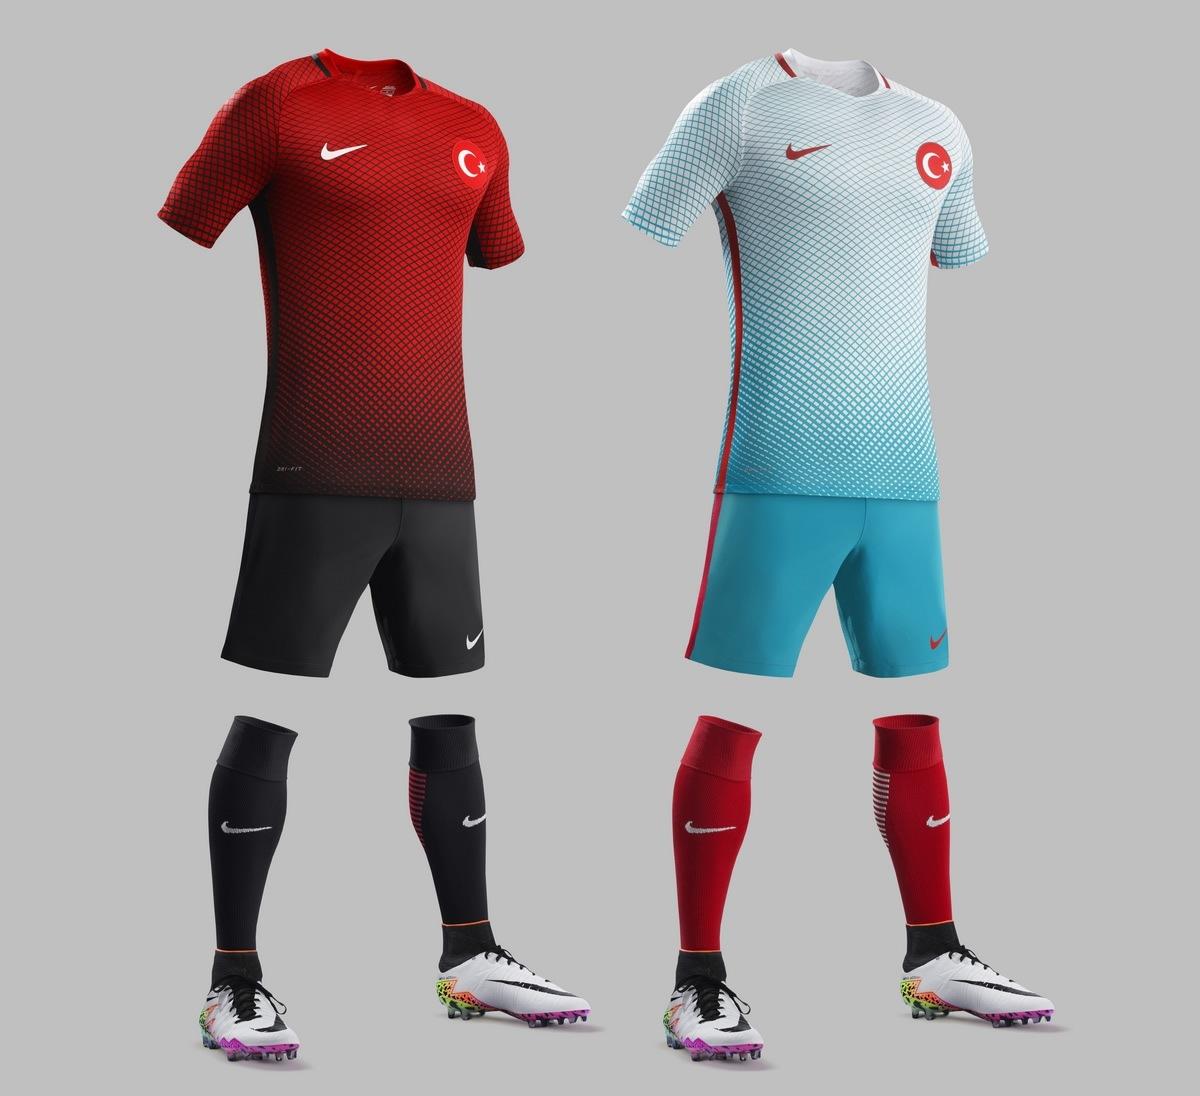 Camisetas Nike de Turquía Euro 2016 | Planeta Fobal